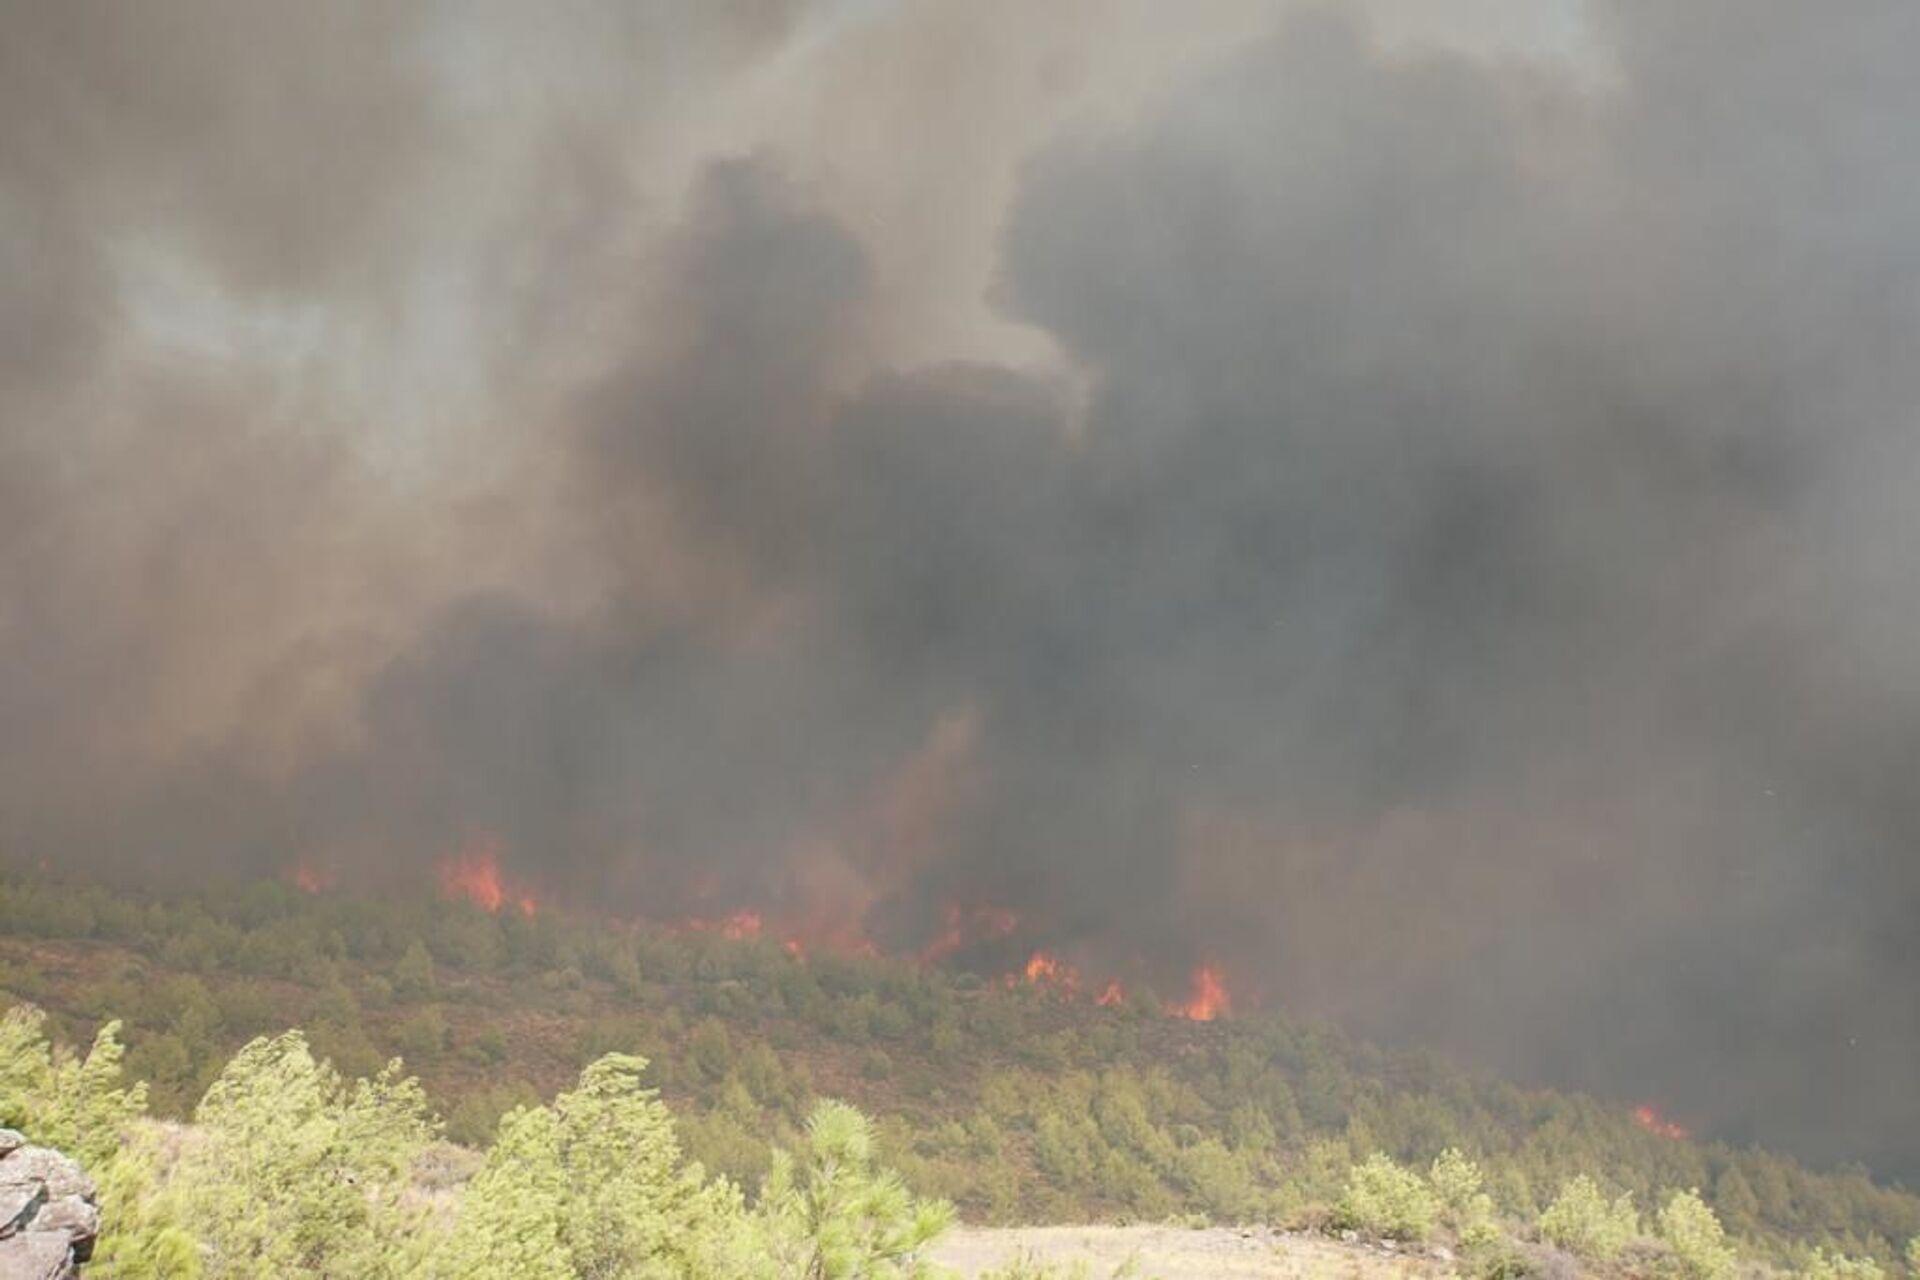 wildfires in the Turkish city of Bodrum - Sputnik International, 1920, 07.09.2021